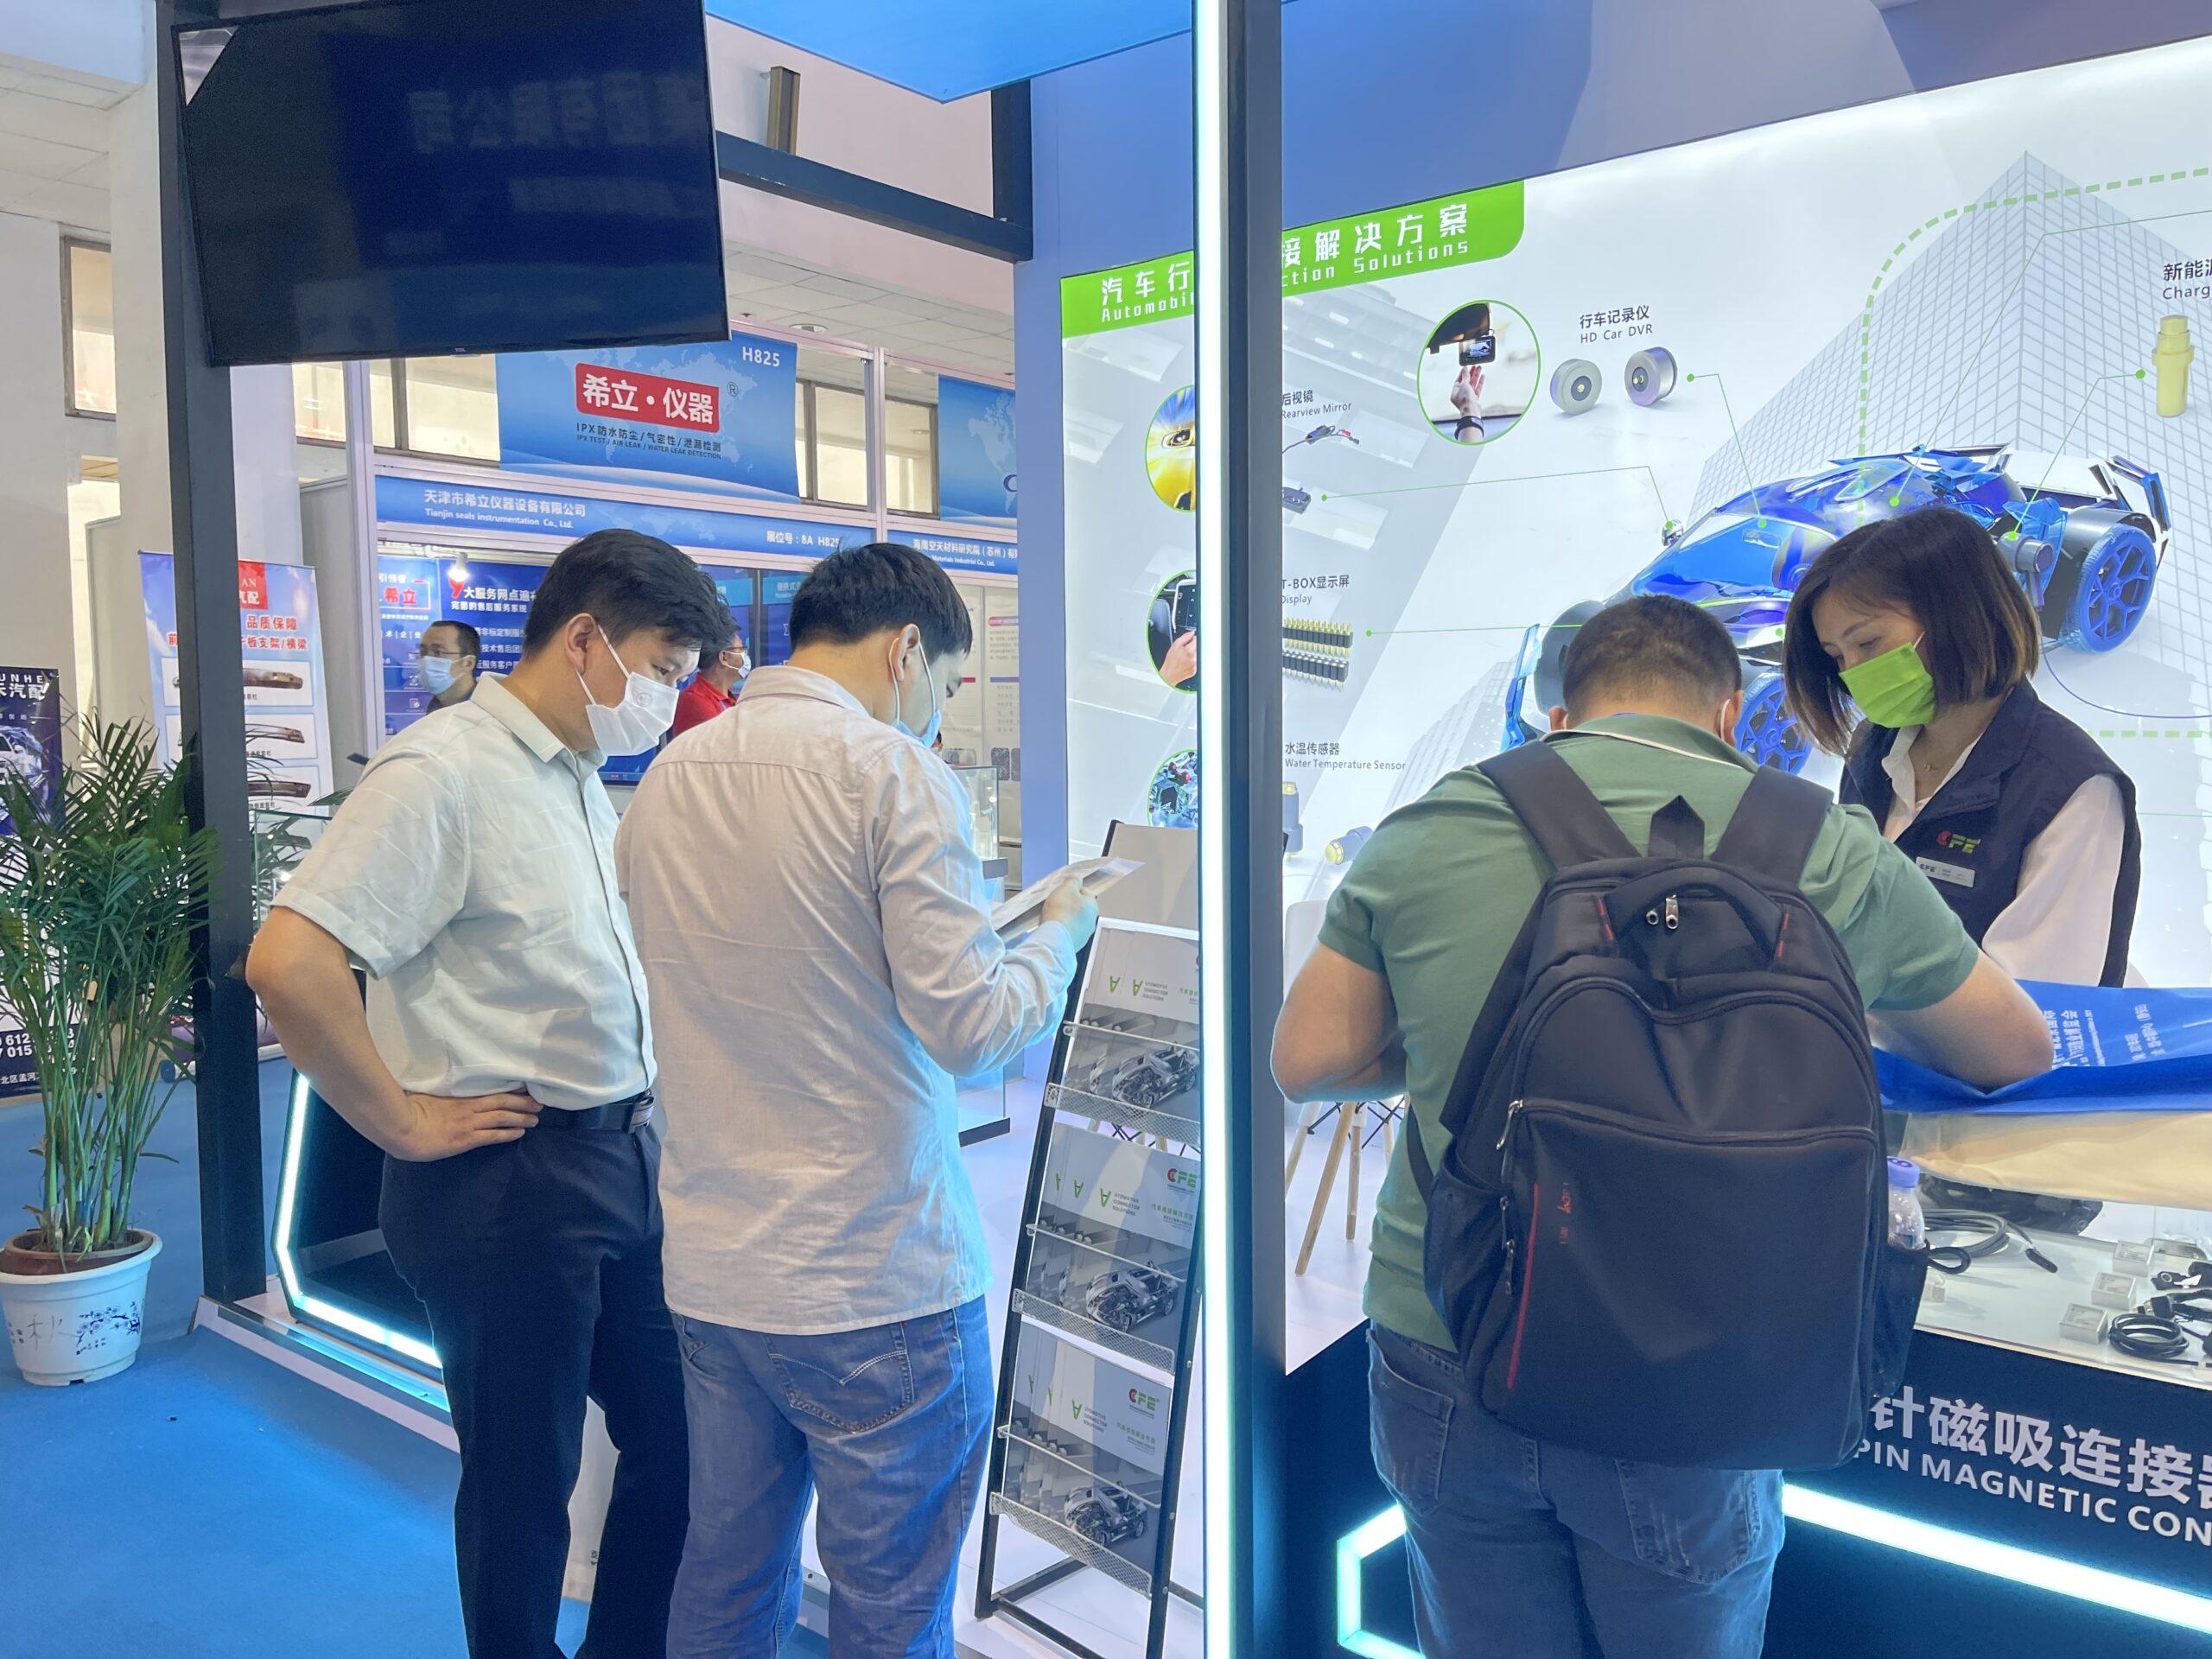 The 2021 China (Beijing) International Automotive Parts Exhibition